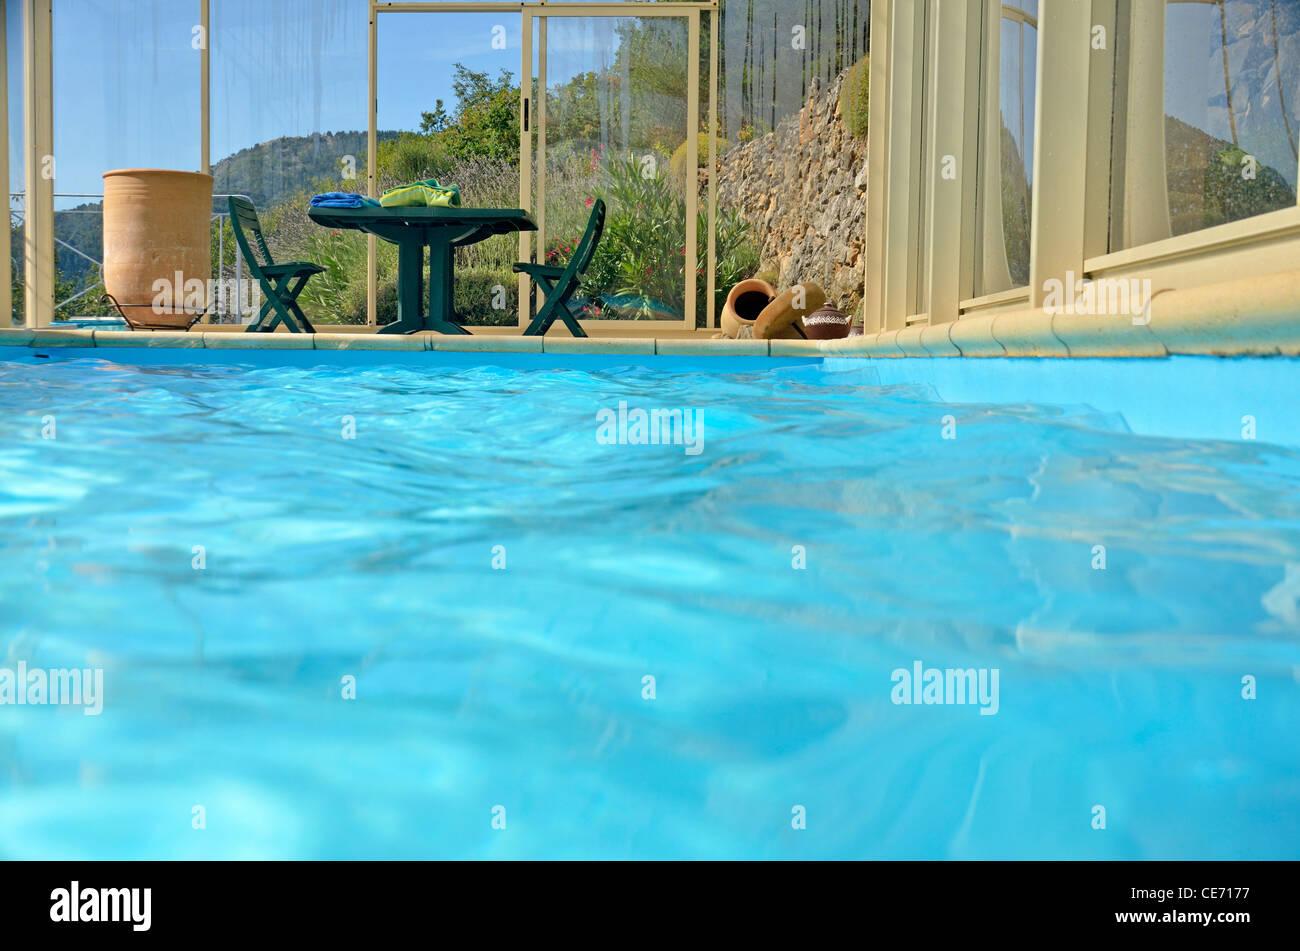 Indoor swimming pool luxus  Swimming Pool Ss01 Stockfotos & Swimming Pool Ss01 Bilder - Alamy